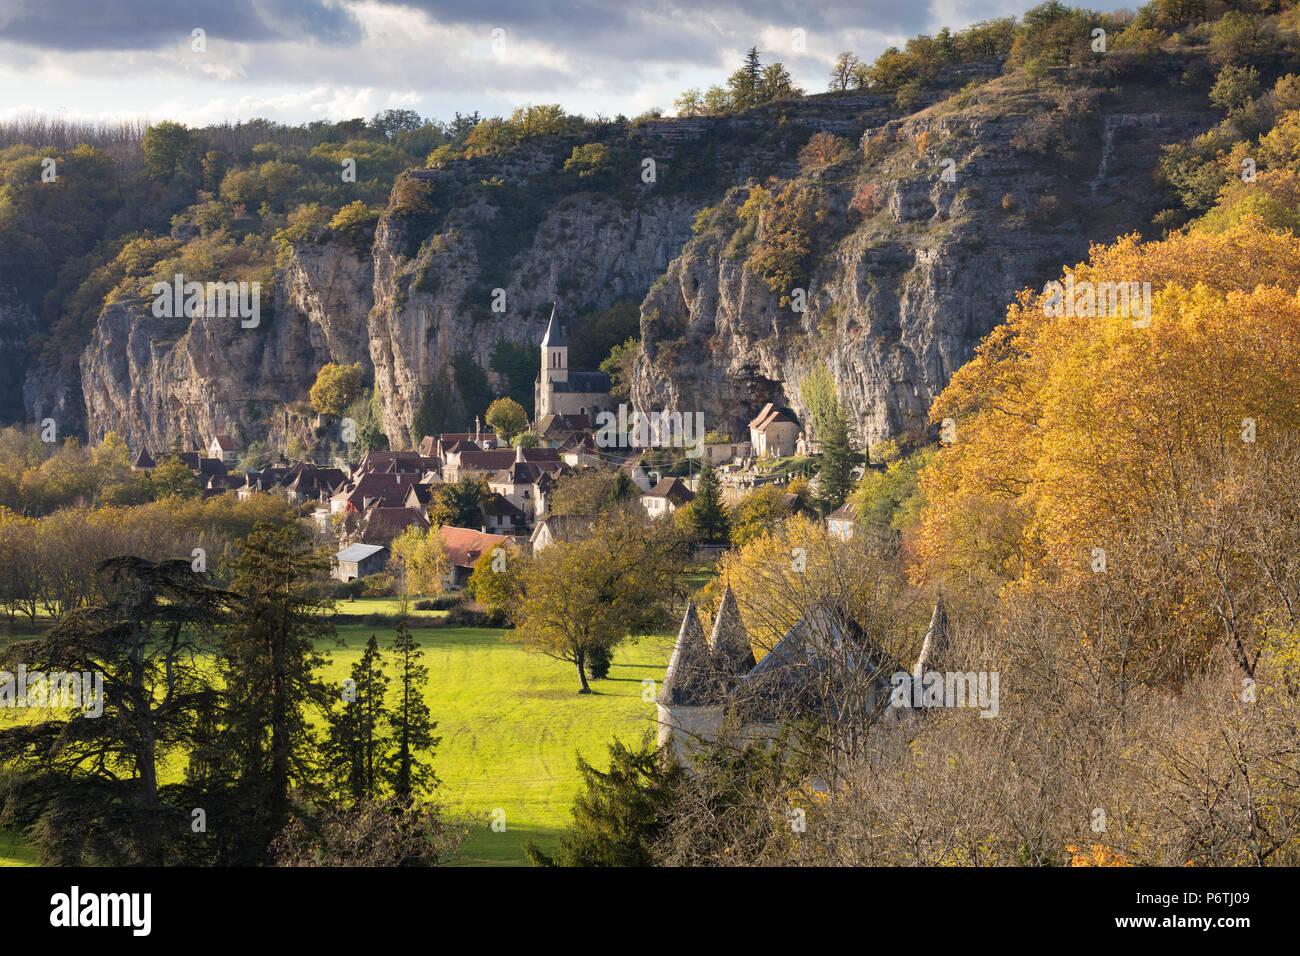 Dorf Gourdon im Herbst, Lot, Midi-Pyrénées, Frankreich Stockbild